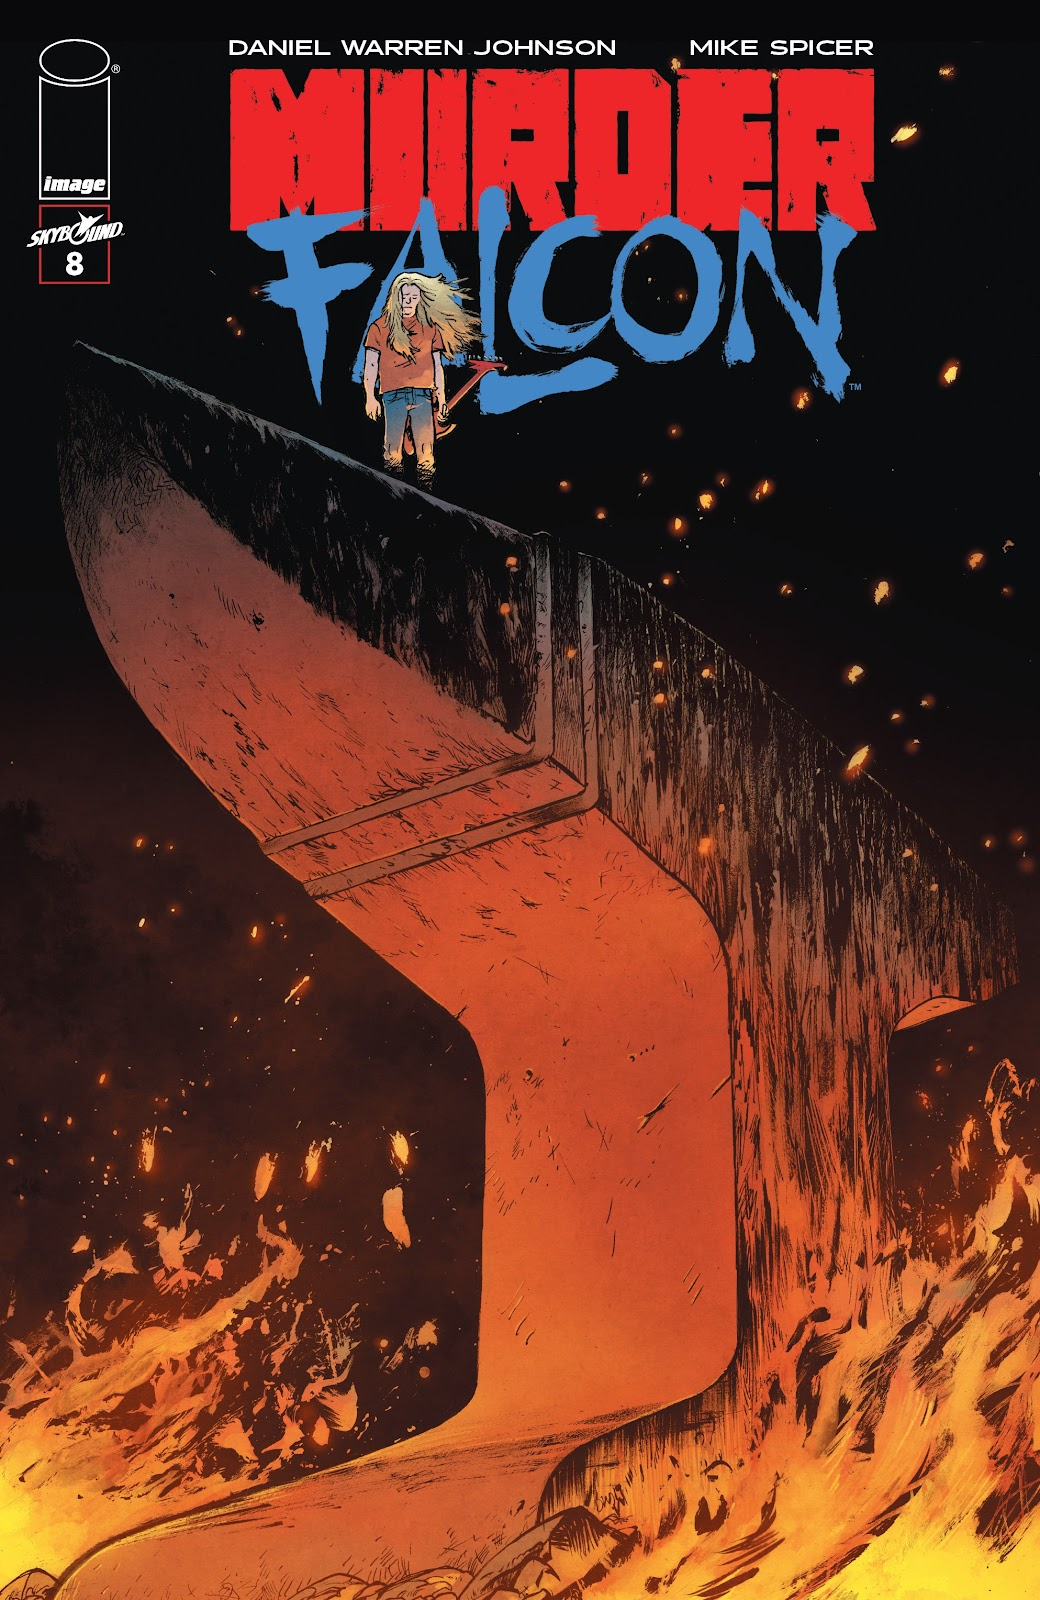 Read online Murder Falcon comic -  Issue #8 - 1